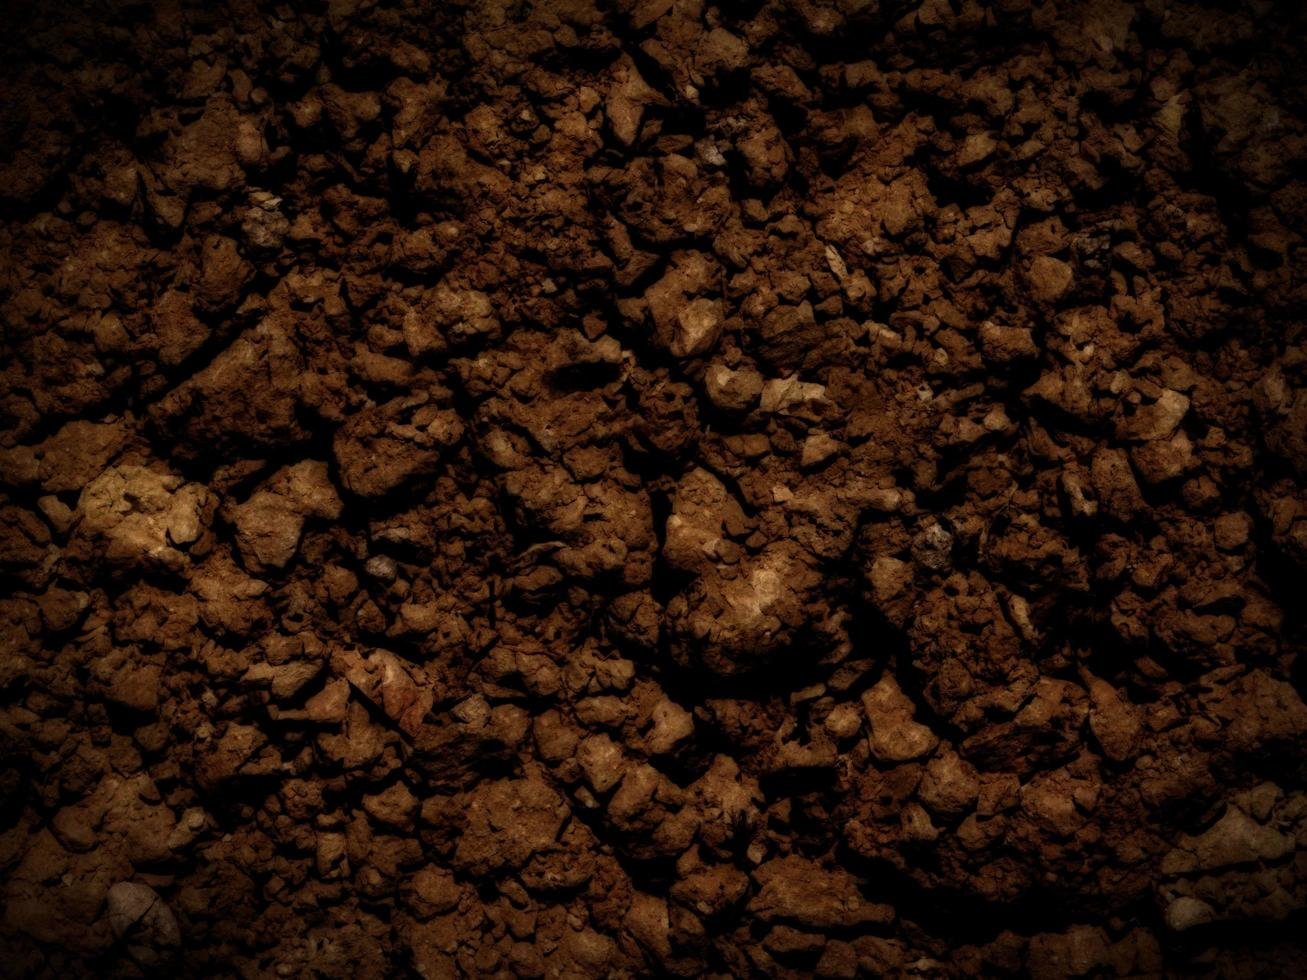 textura tierra oscura foto